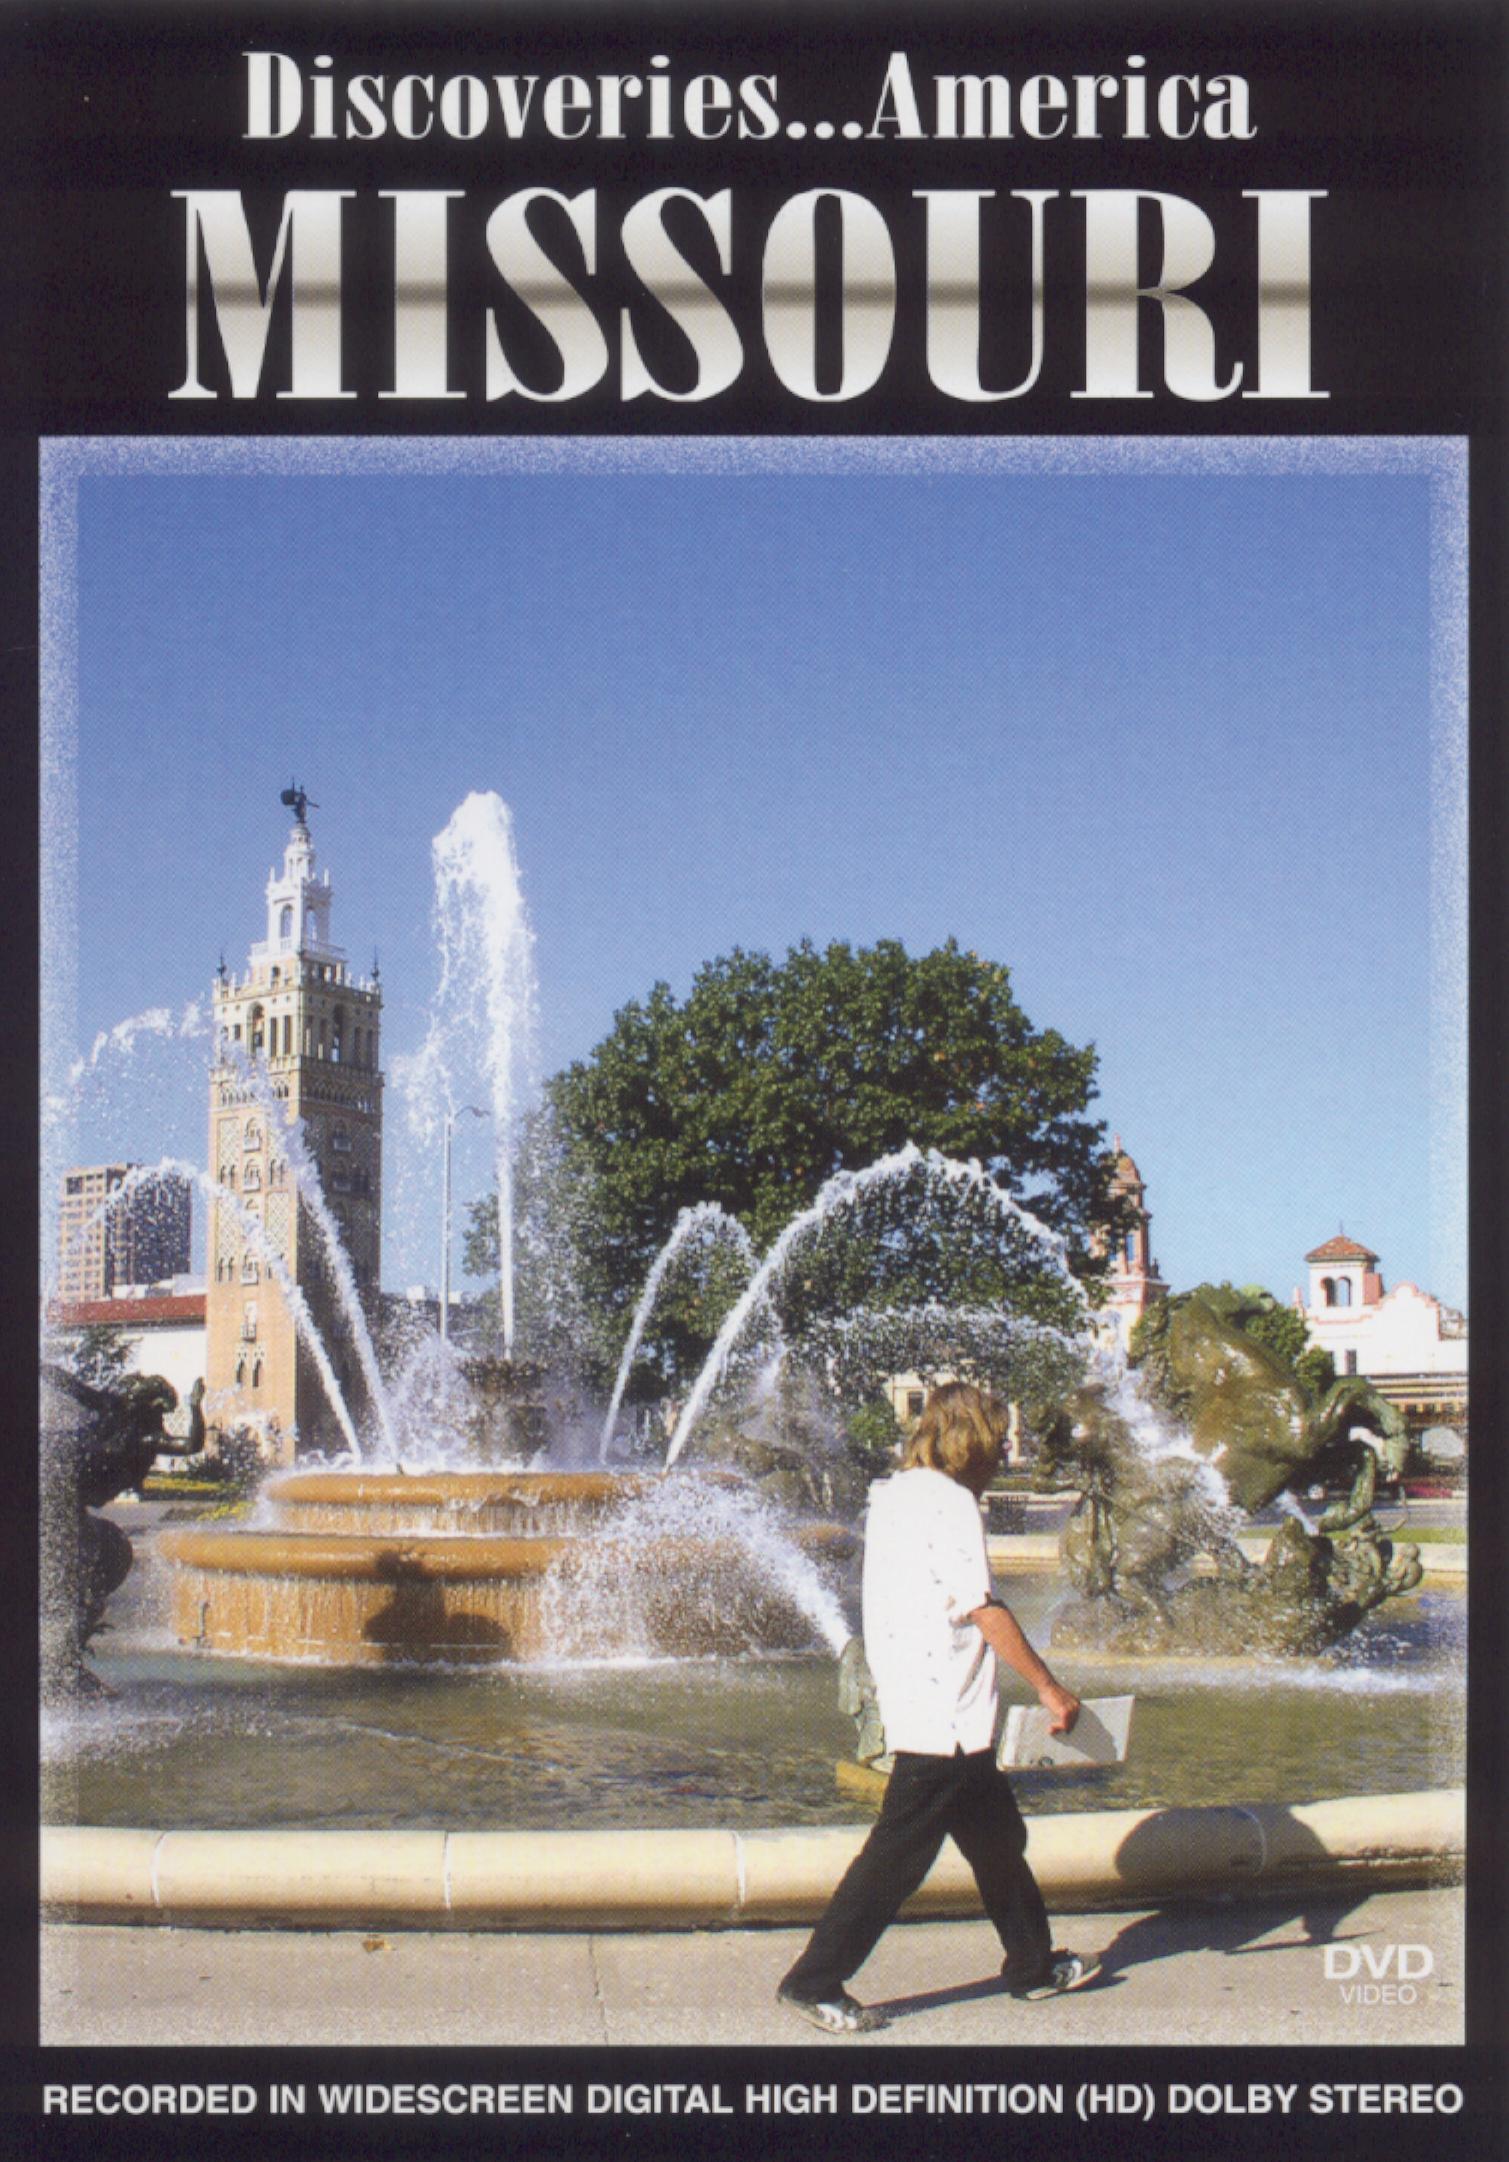 Discoveries... America: Missouri